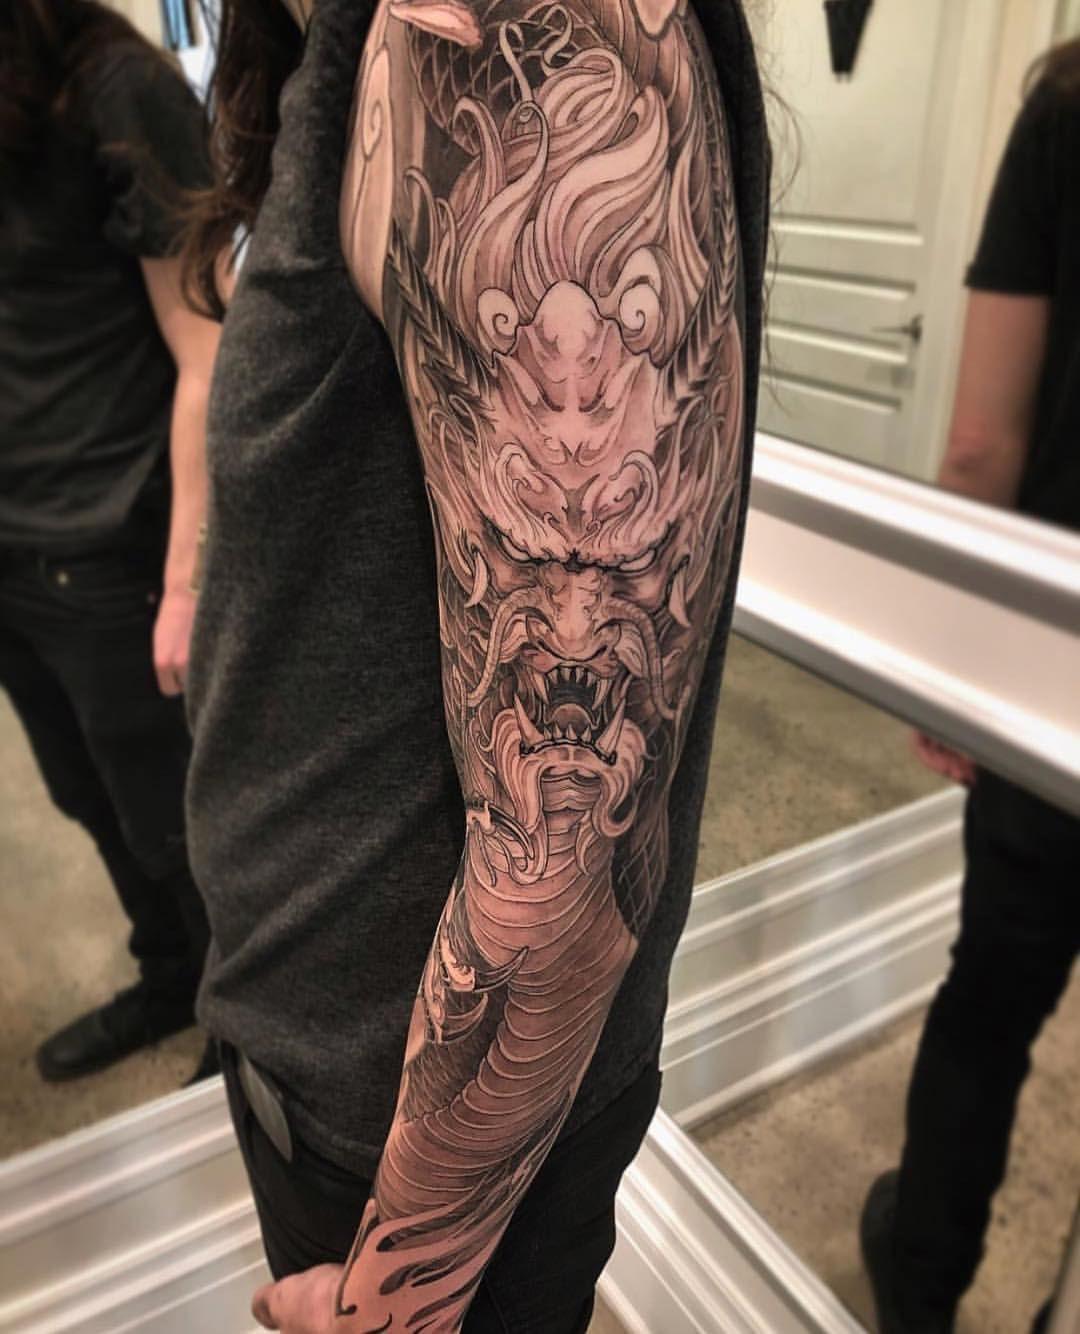 Chronic Ink Tattoo Kitsilano Vancouver Dragon Sleeve By Truong87 Yaponskie Tatuirovki Drakona Tatuirovka Na Ruke Yaponskie Tatuirovki